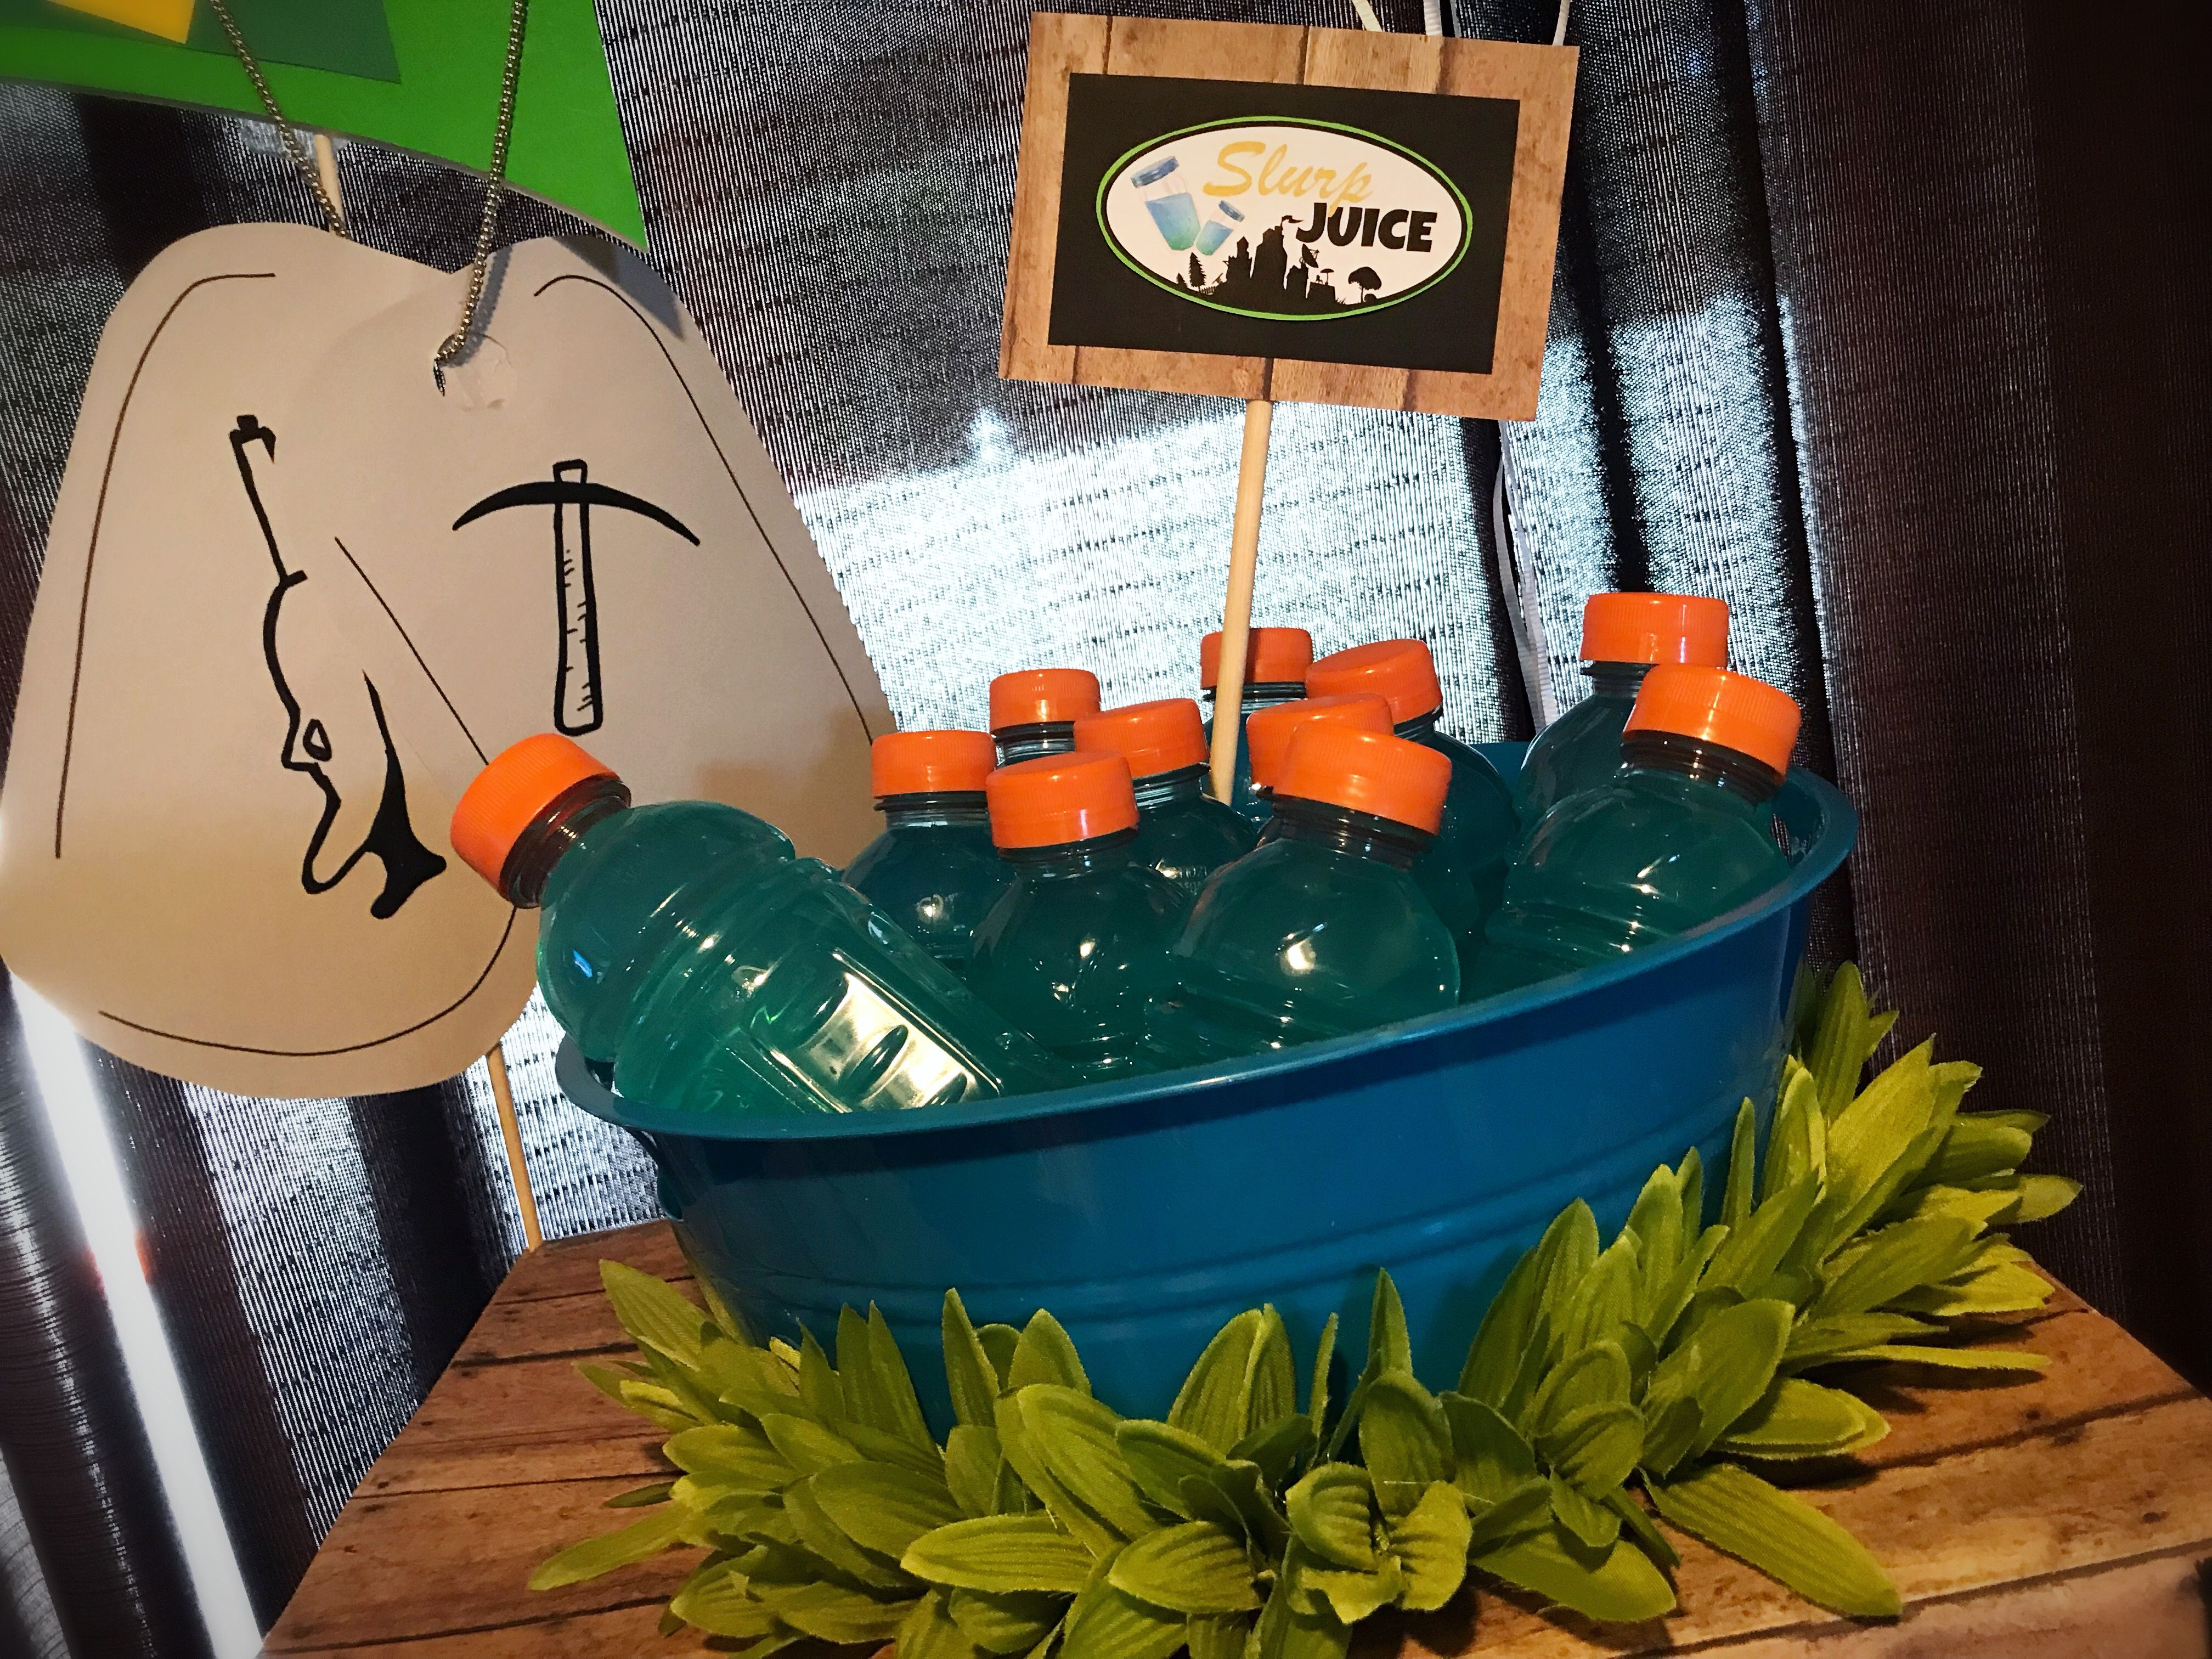 Fortnite birthday party slurp juice table decorations